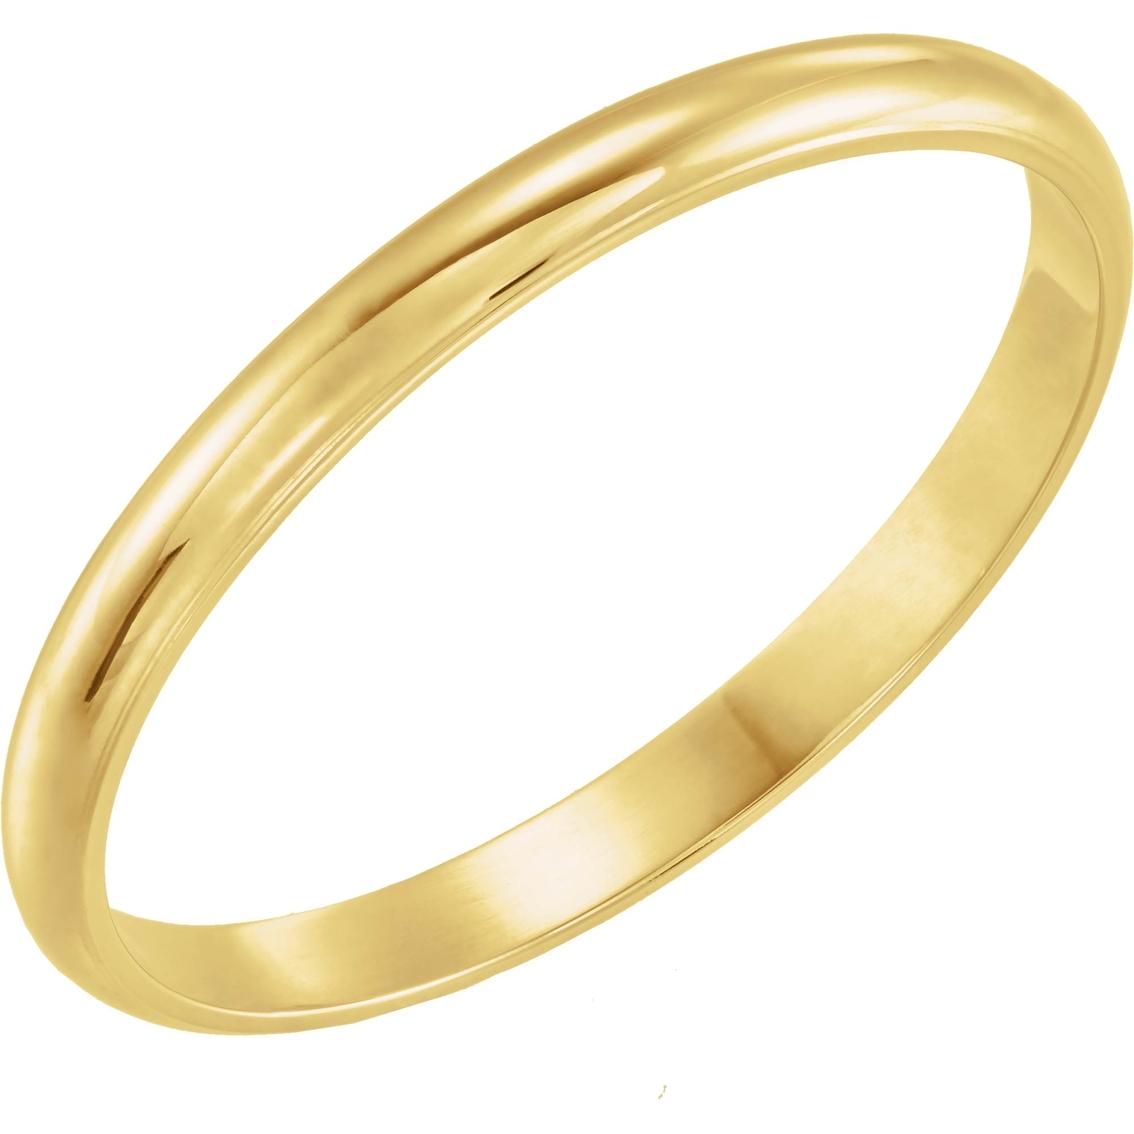 14K White Gold Youth Band Size 0.5